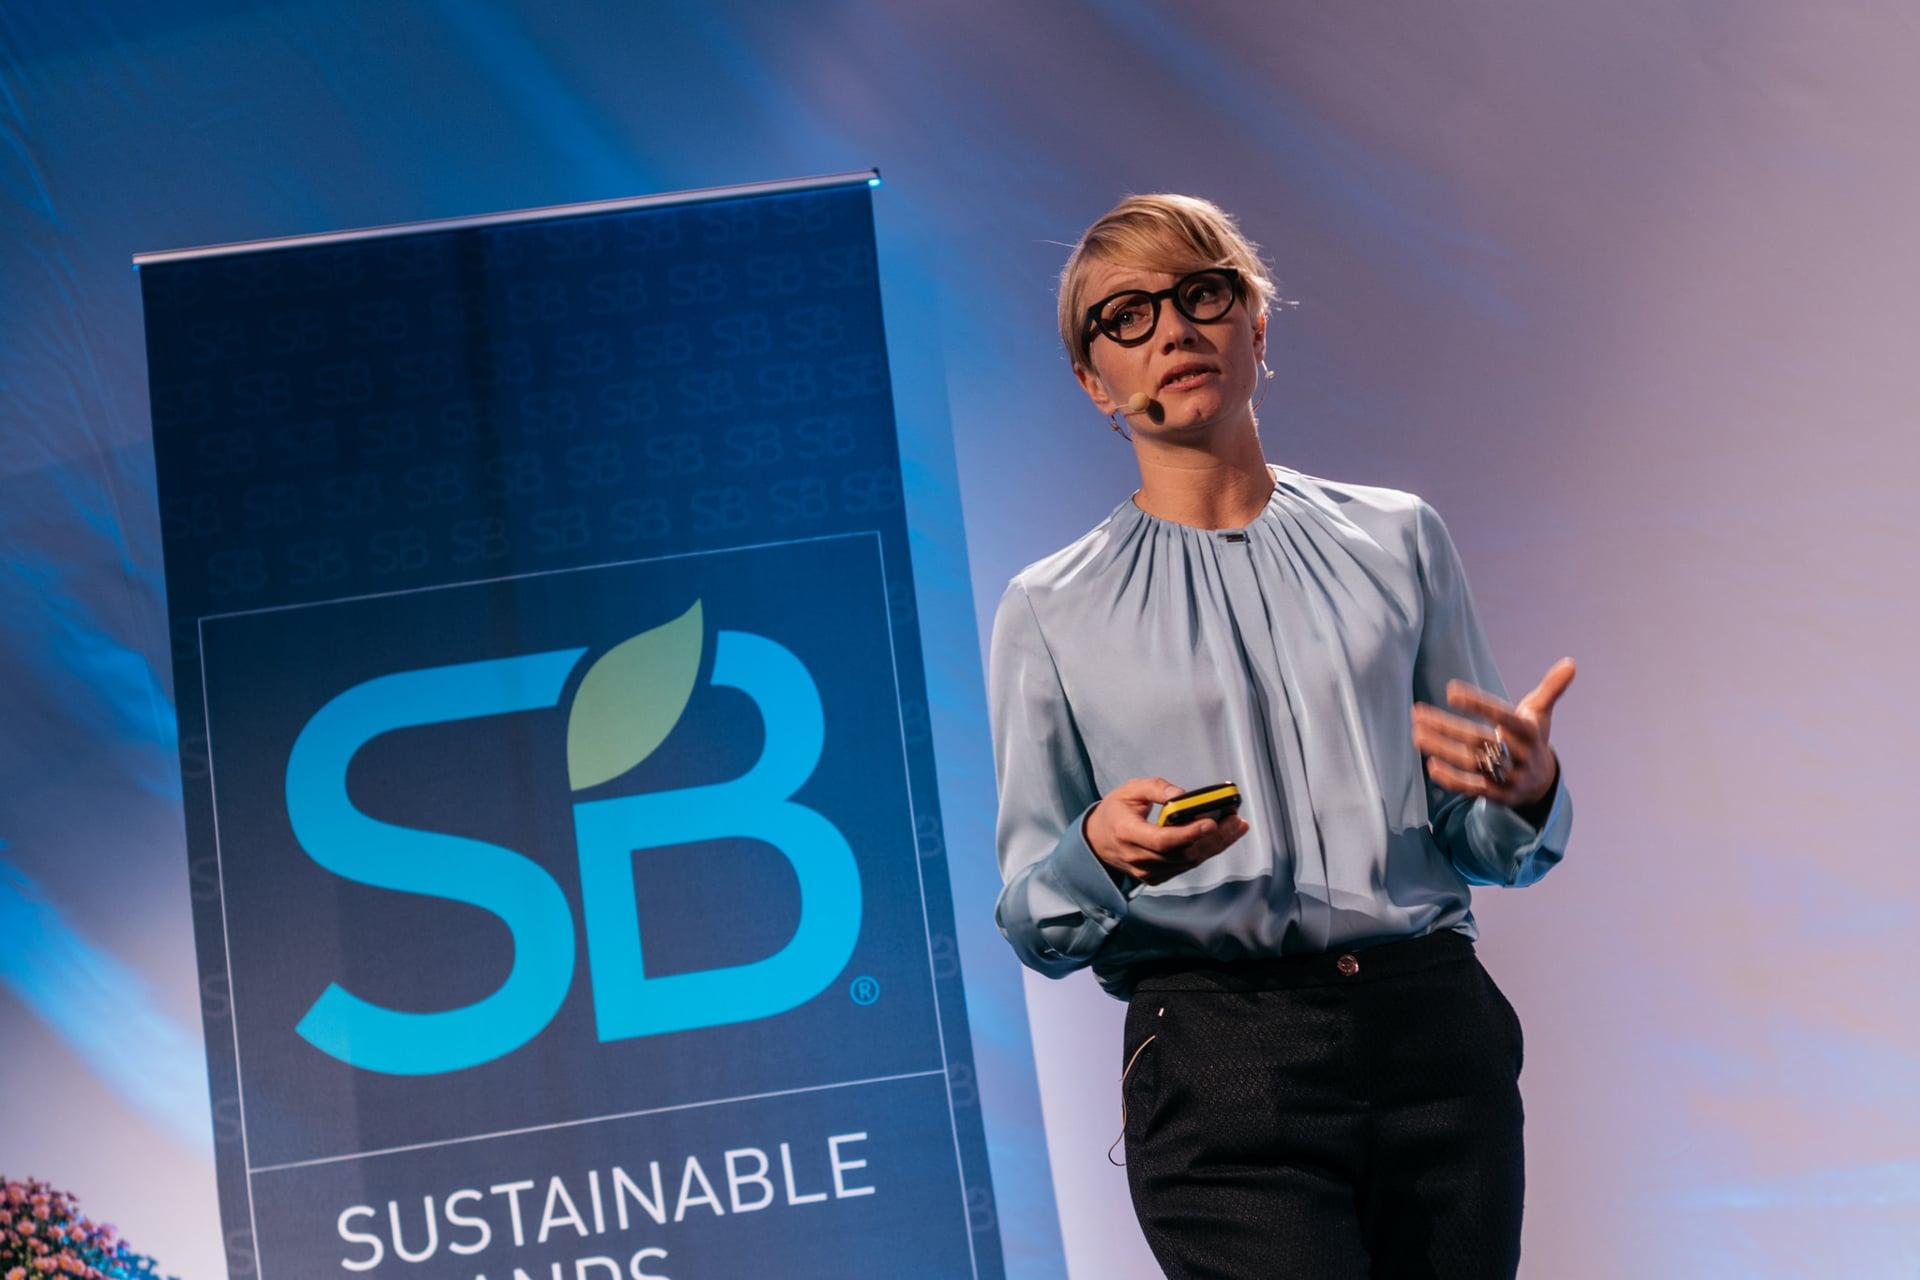 SB'16 Copenhagen Keynote / Inspiring Consumer Behavior Change: How to Shape New Shopping and Consumption Behaviors